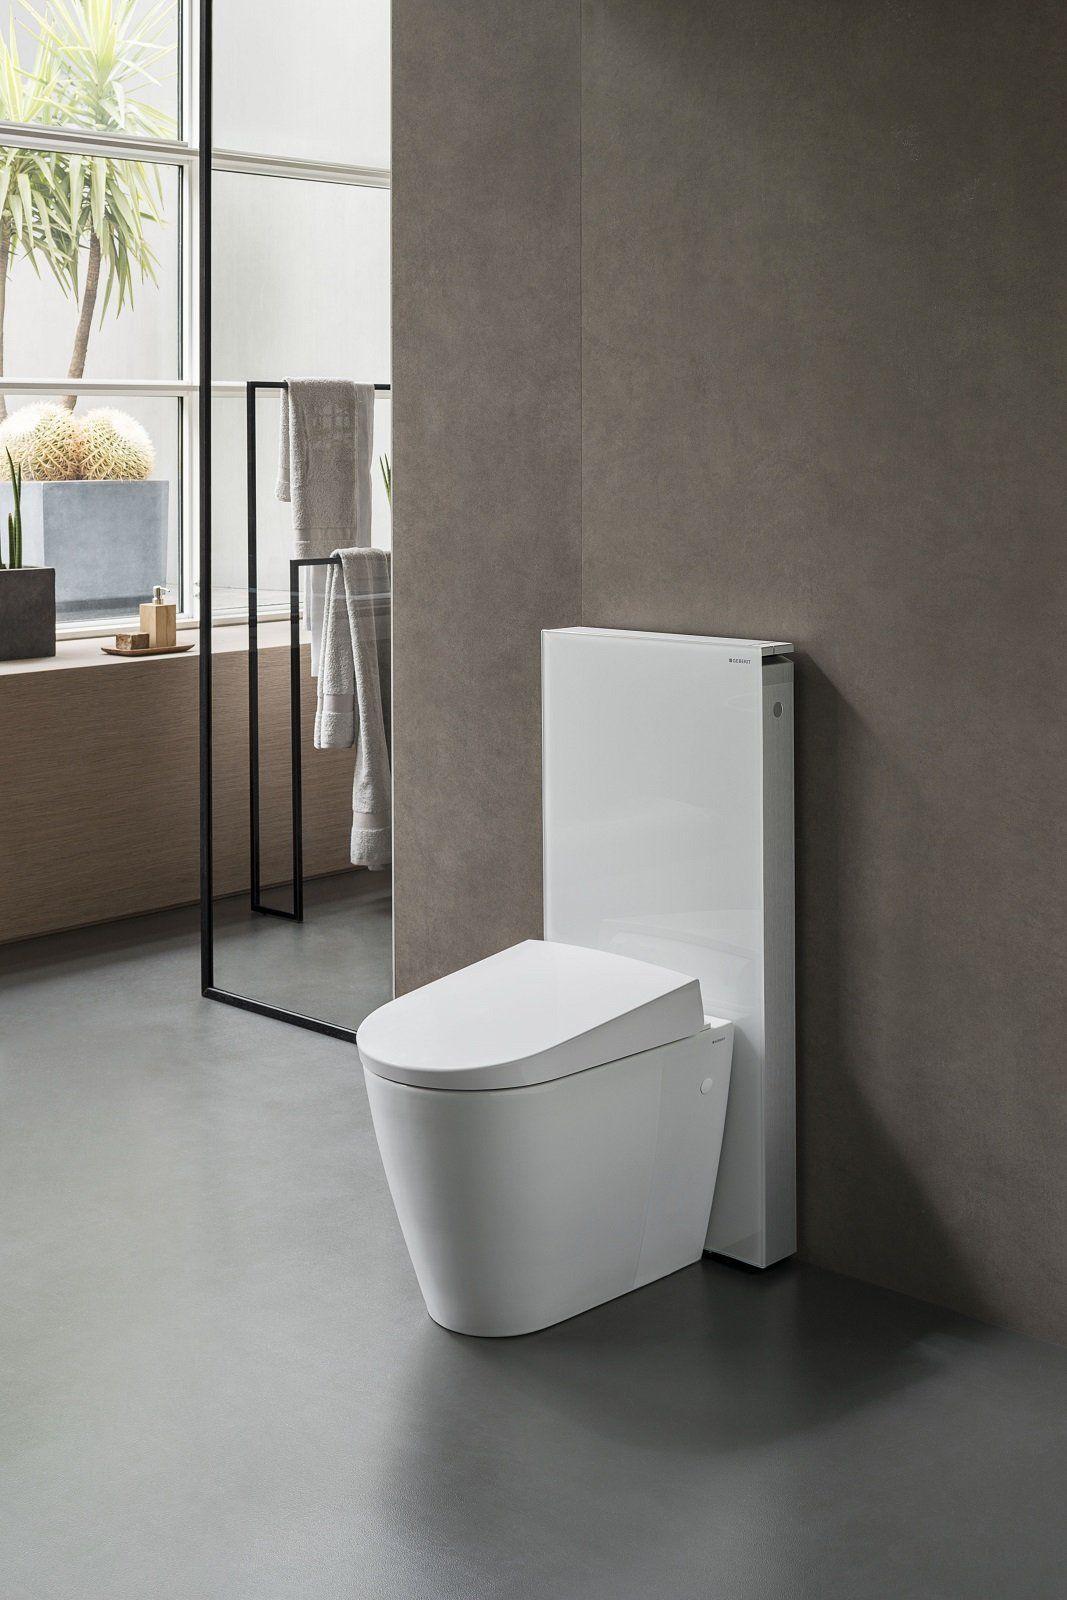 Pleasing I Water Bidet Di Geberit A Cersaie 2016 Toilet Downstairs Dailytribune Chair Design For Home Dailytribuneorg